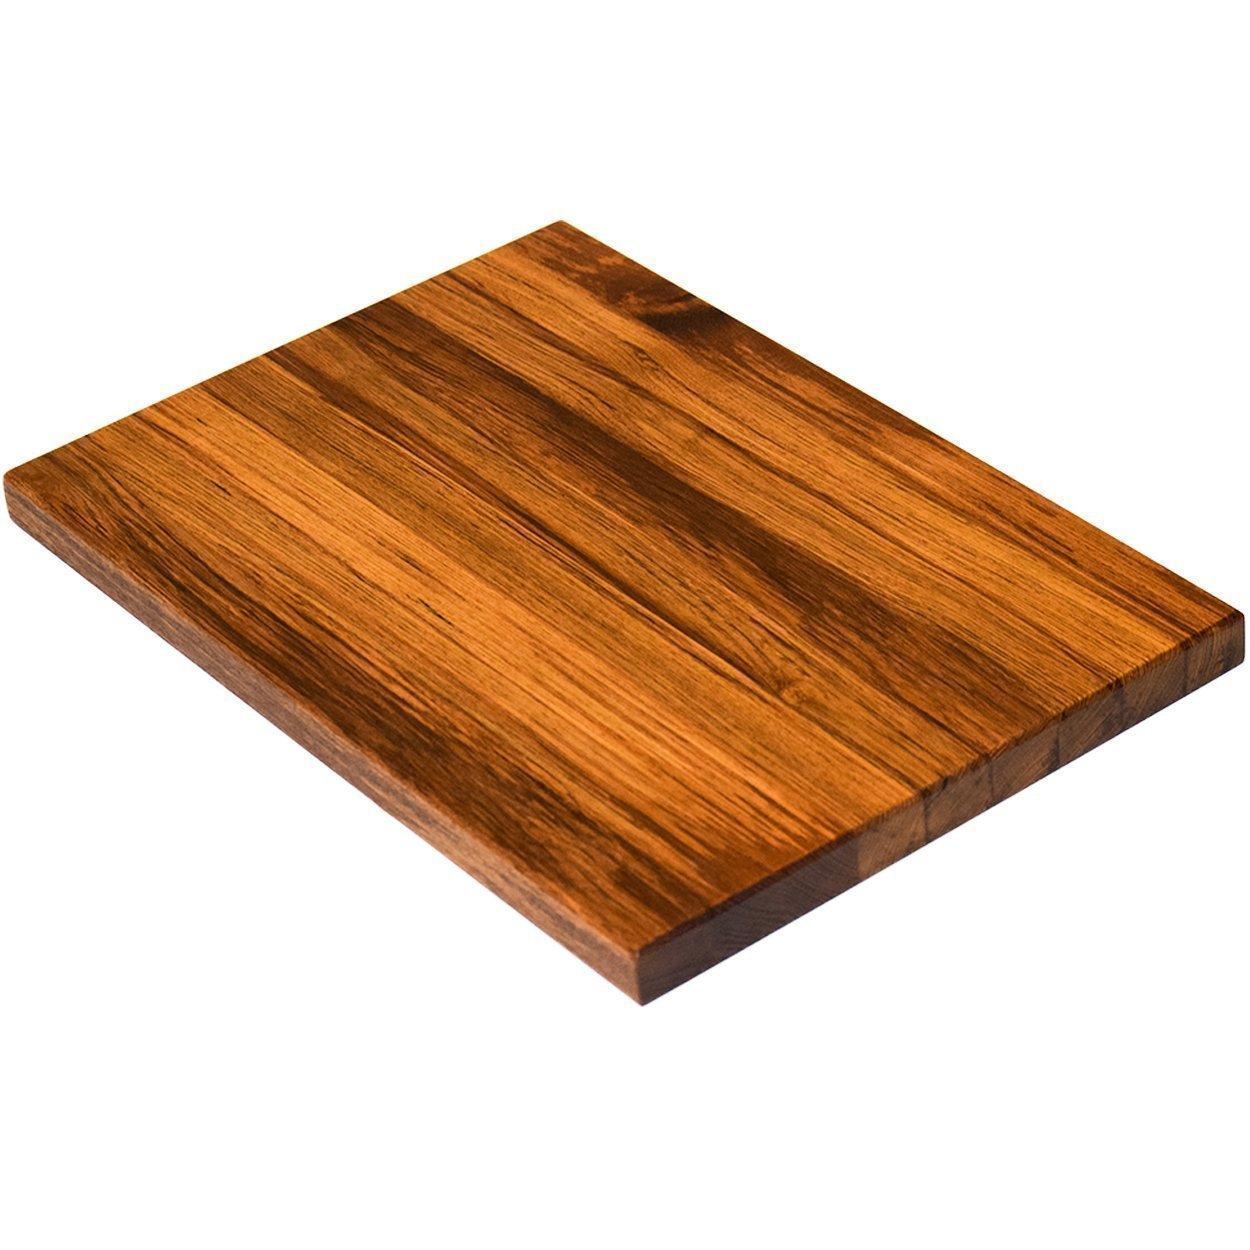 Teak Wood Edge Grain Cutting Board Handmade Reversible Butcher Block by The Practical Plankist (Image #4)